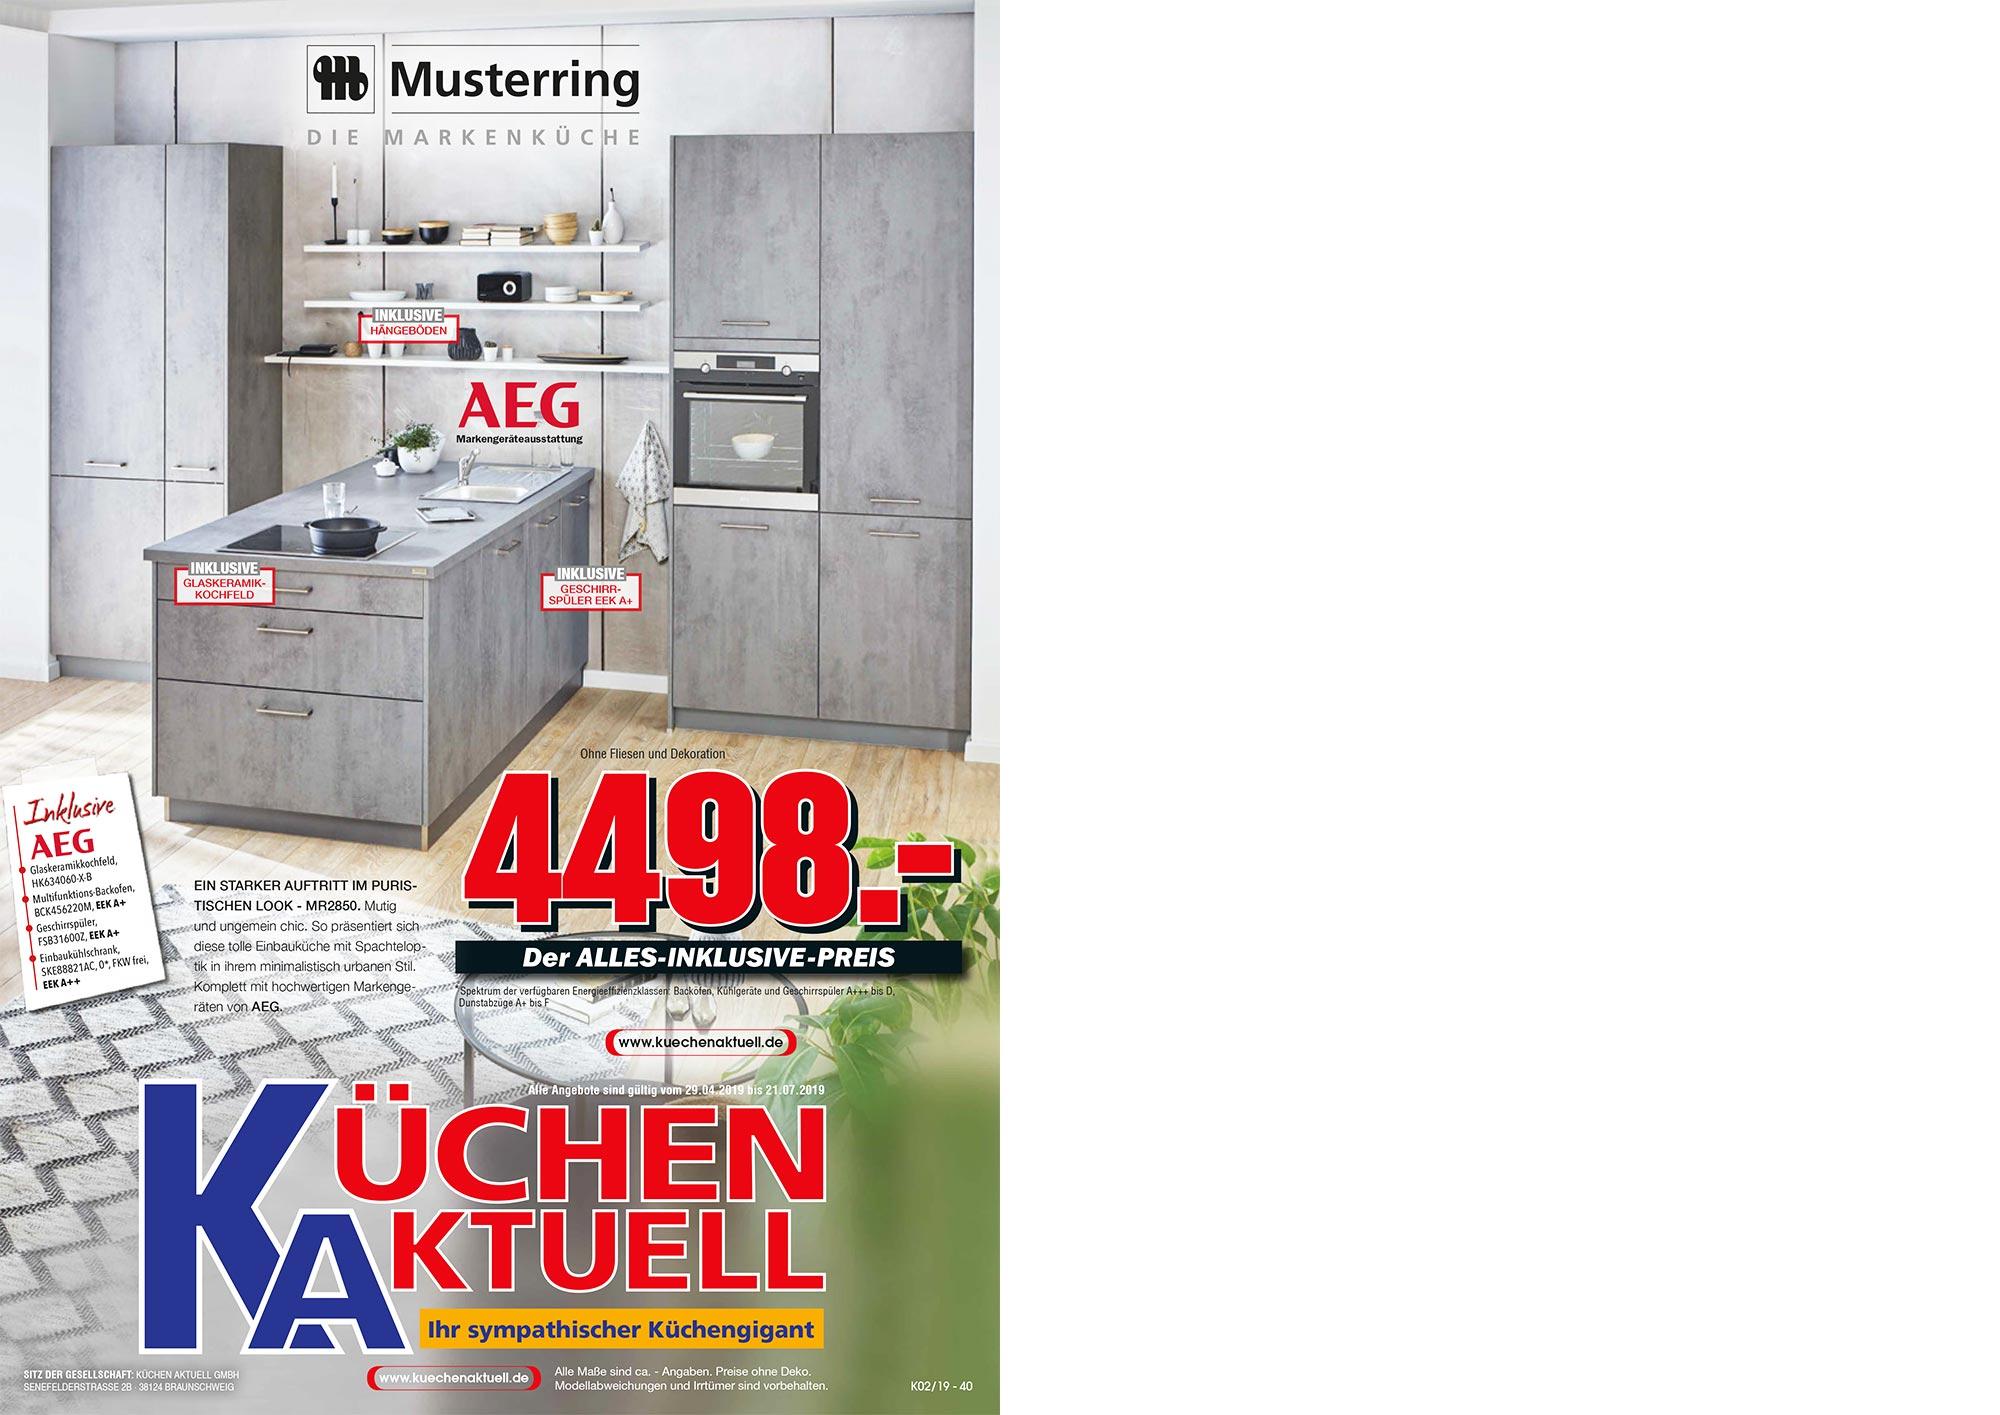 Kuchenkatalog Kuchen Aktuell Katalog Online Ansehen